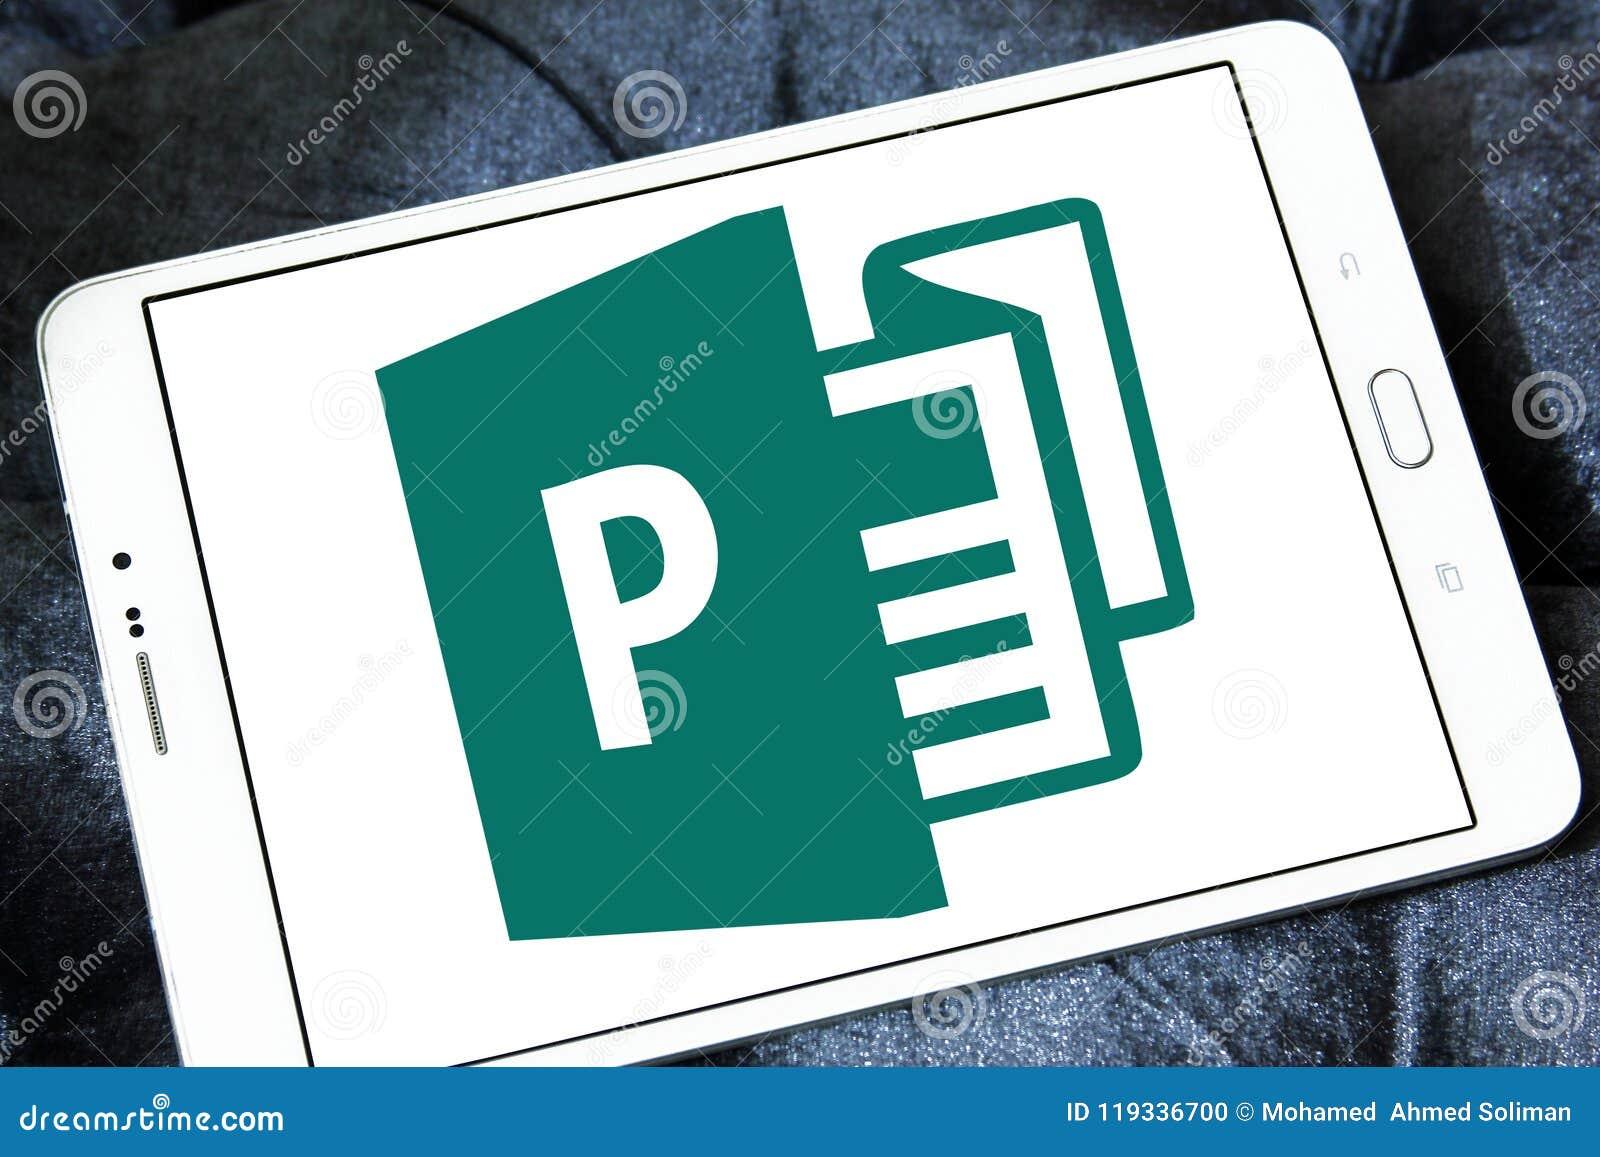 microsoft office publisher logo editorial image